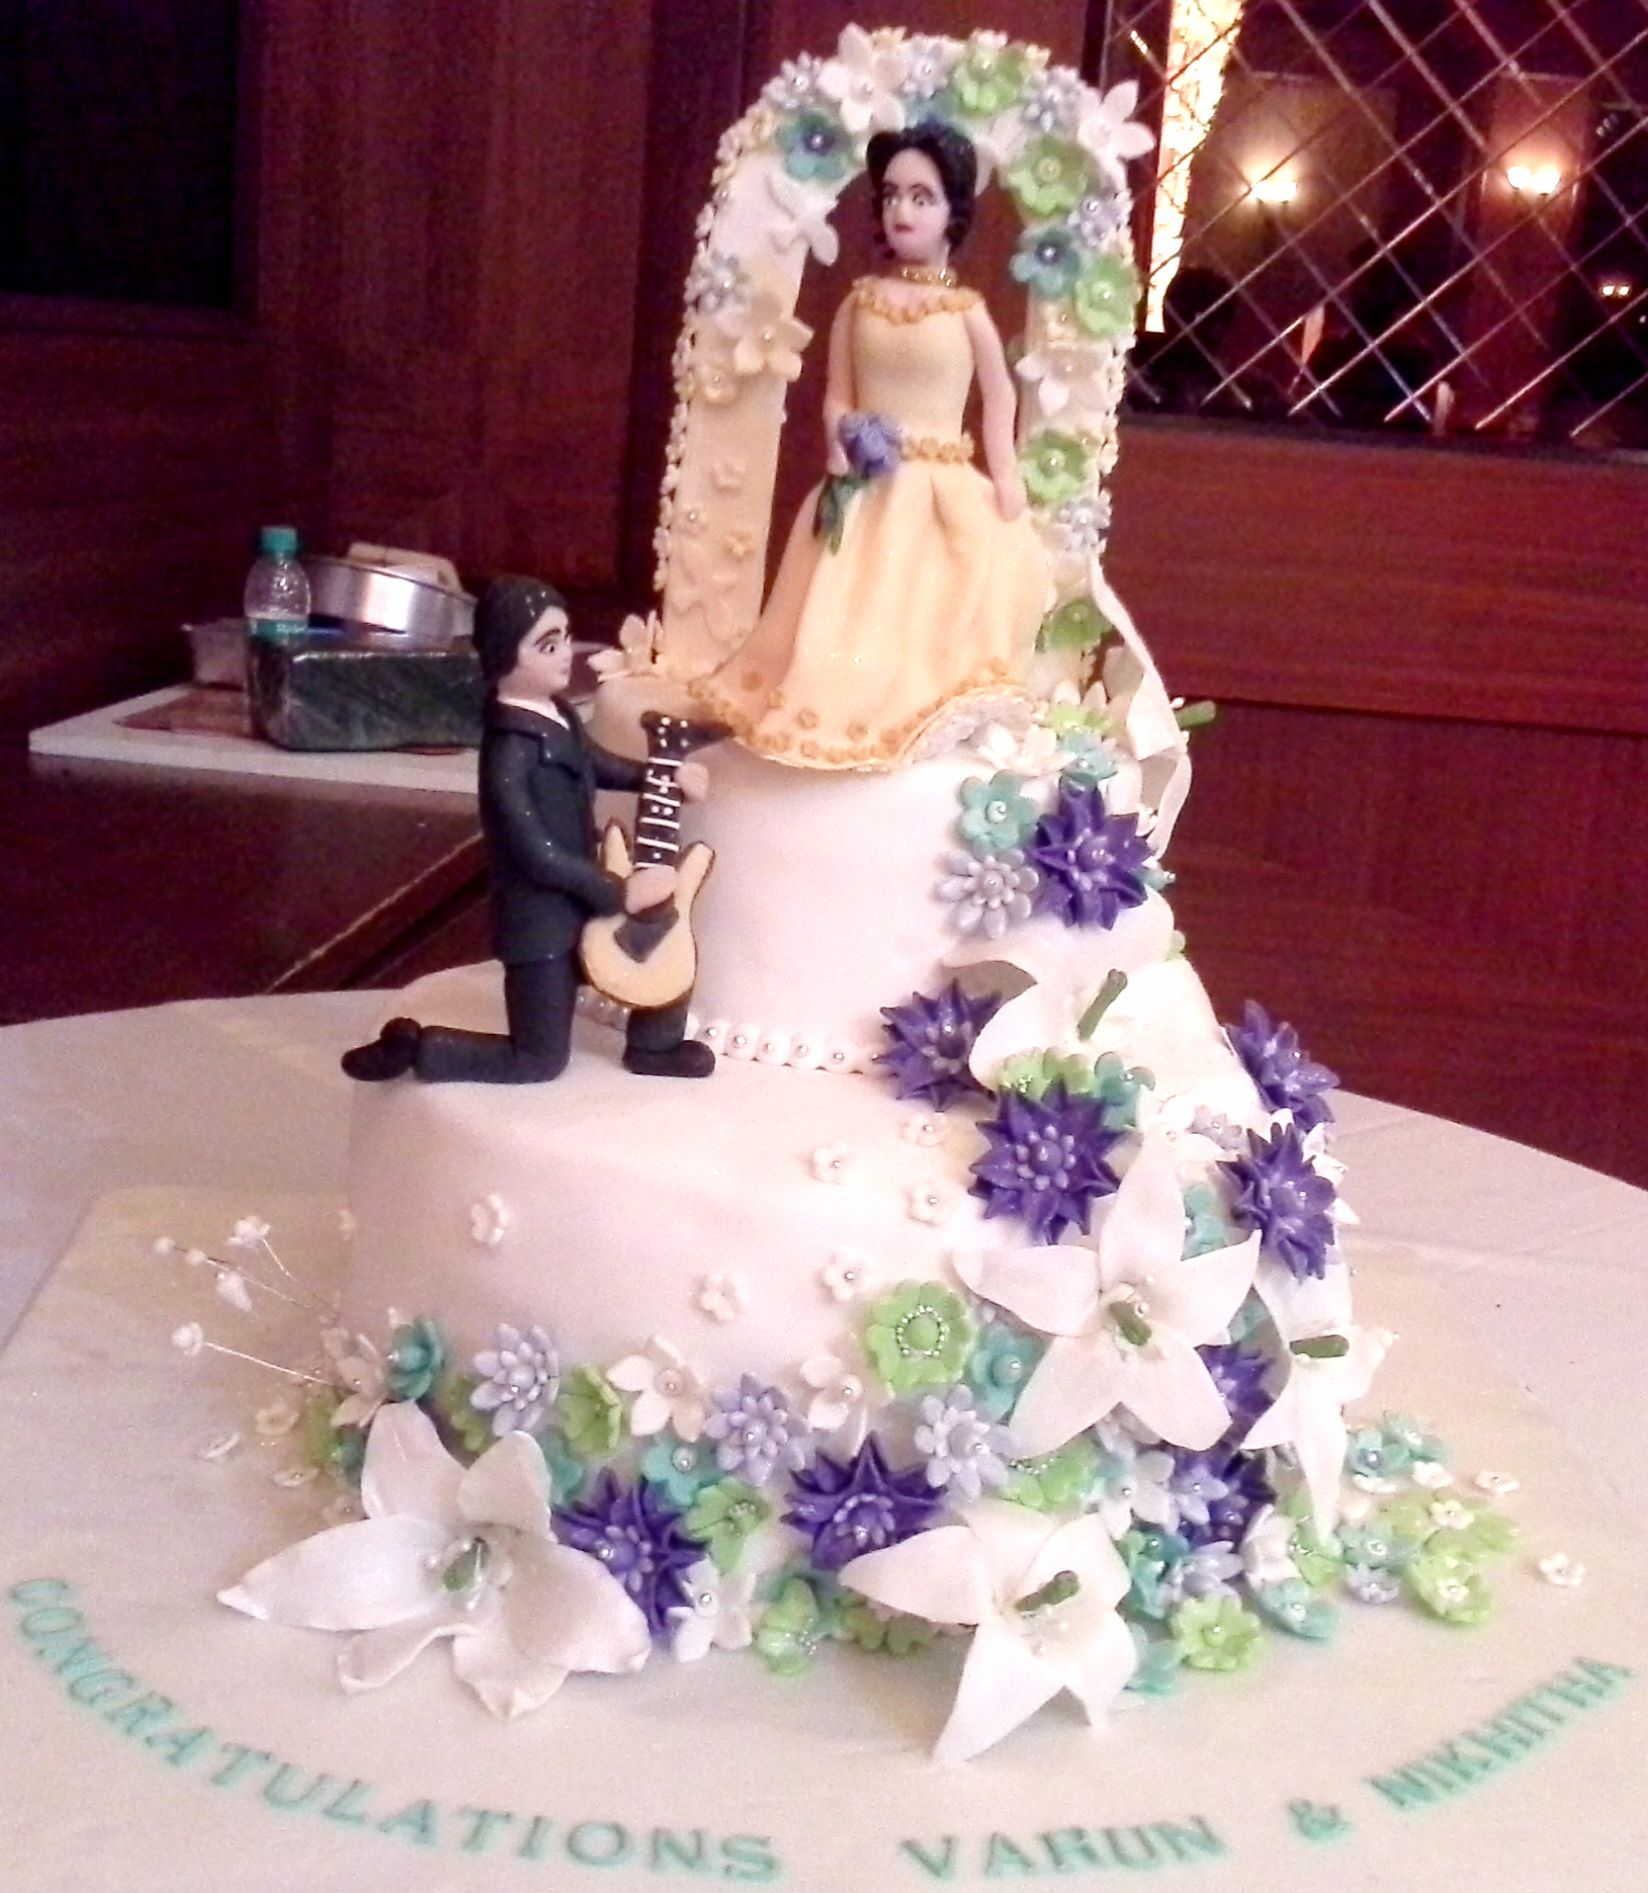 Custom designed birthday, anniversary, wedding cakes.Order